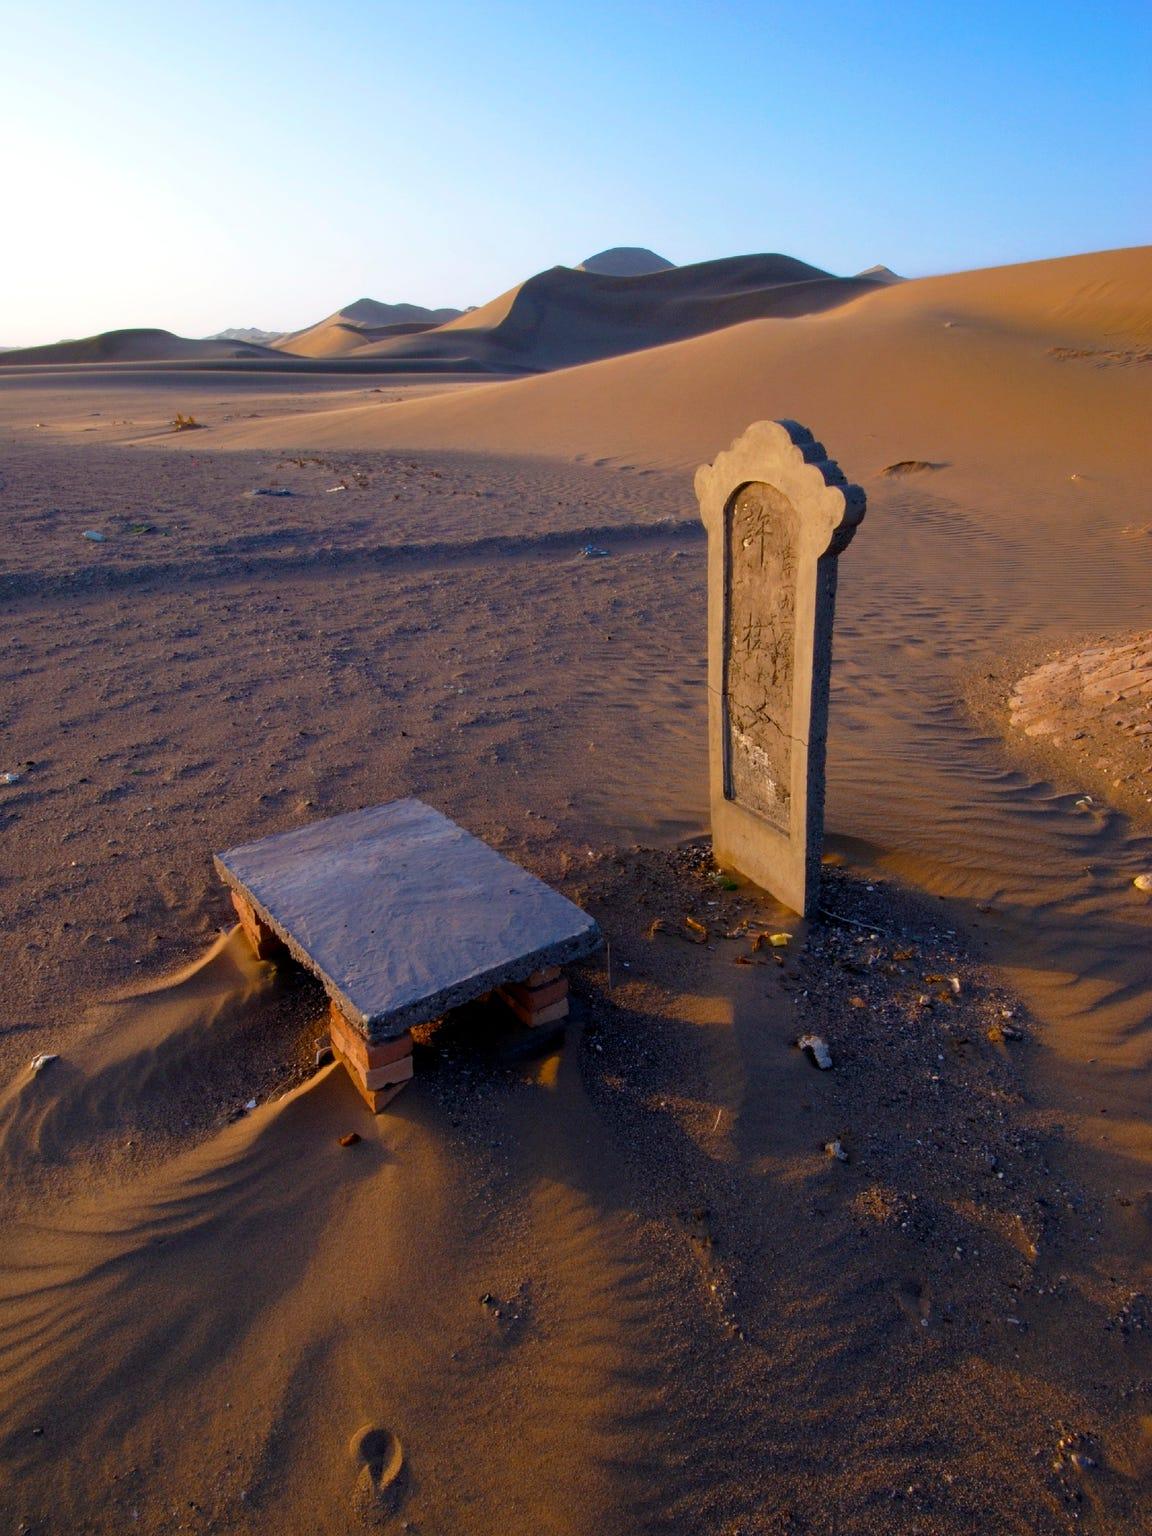 A grave in the Gobi Desert near Dunhuang